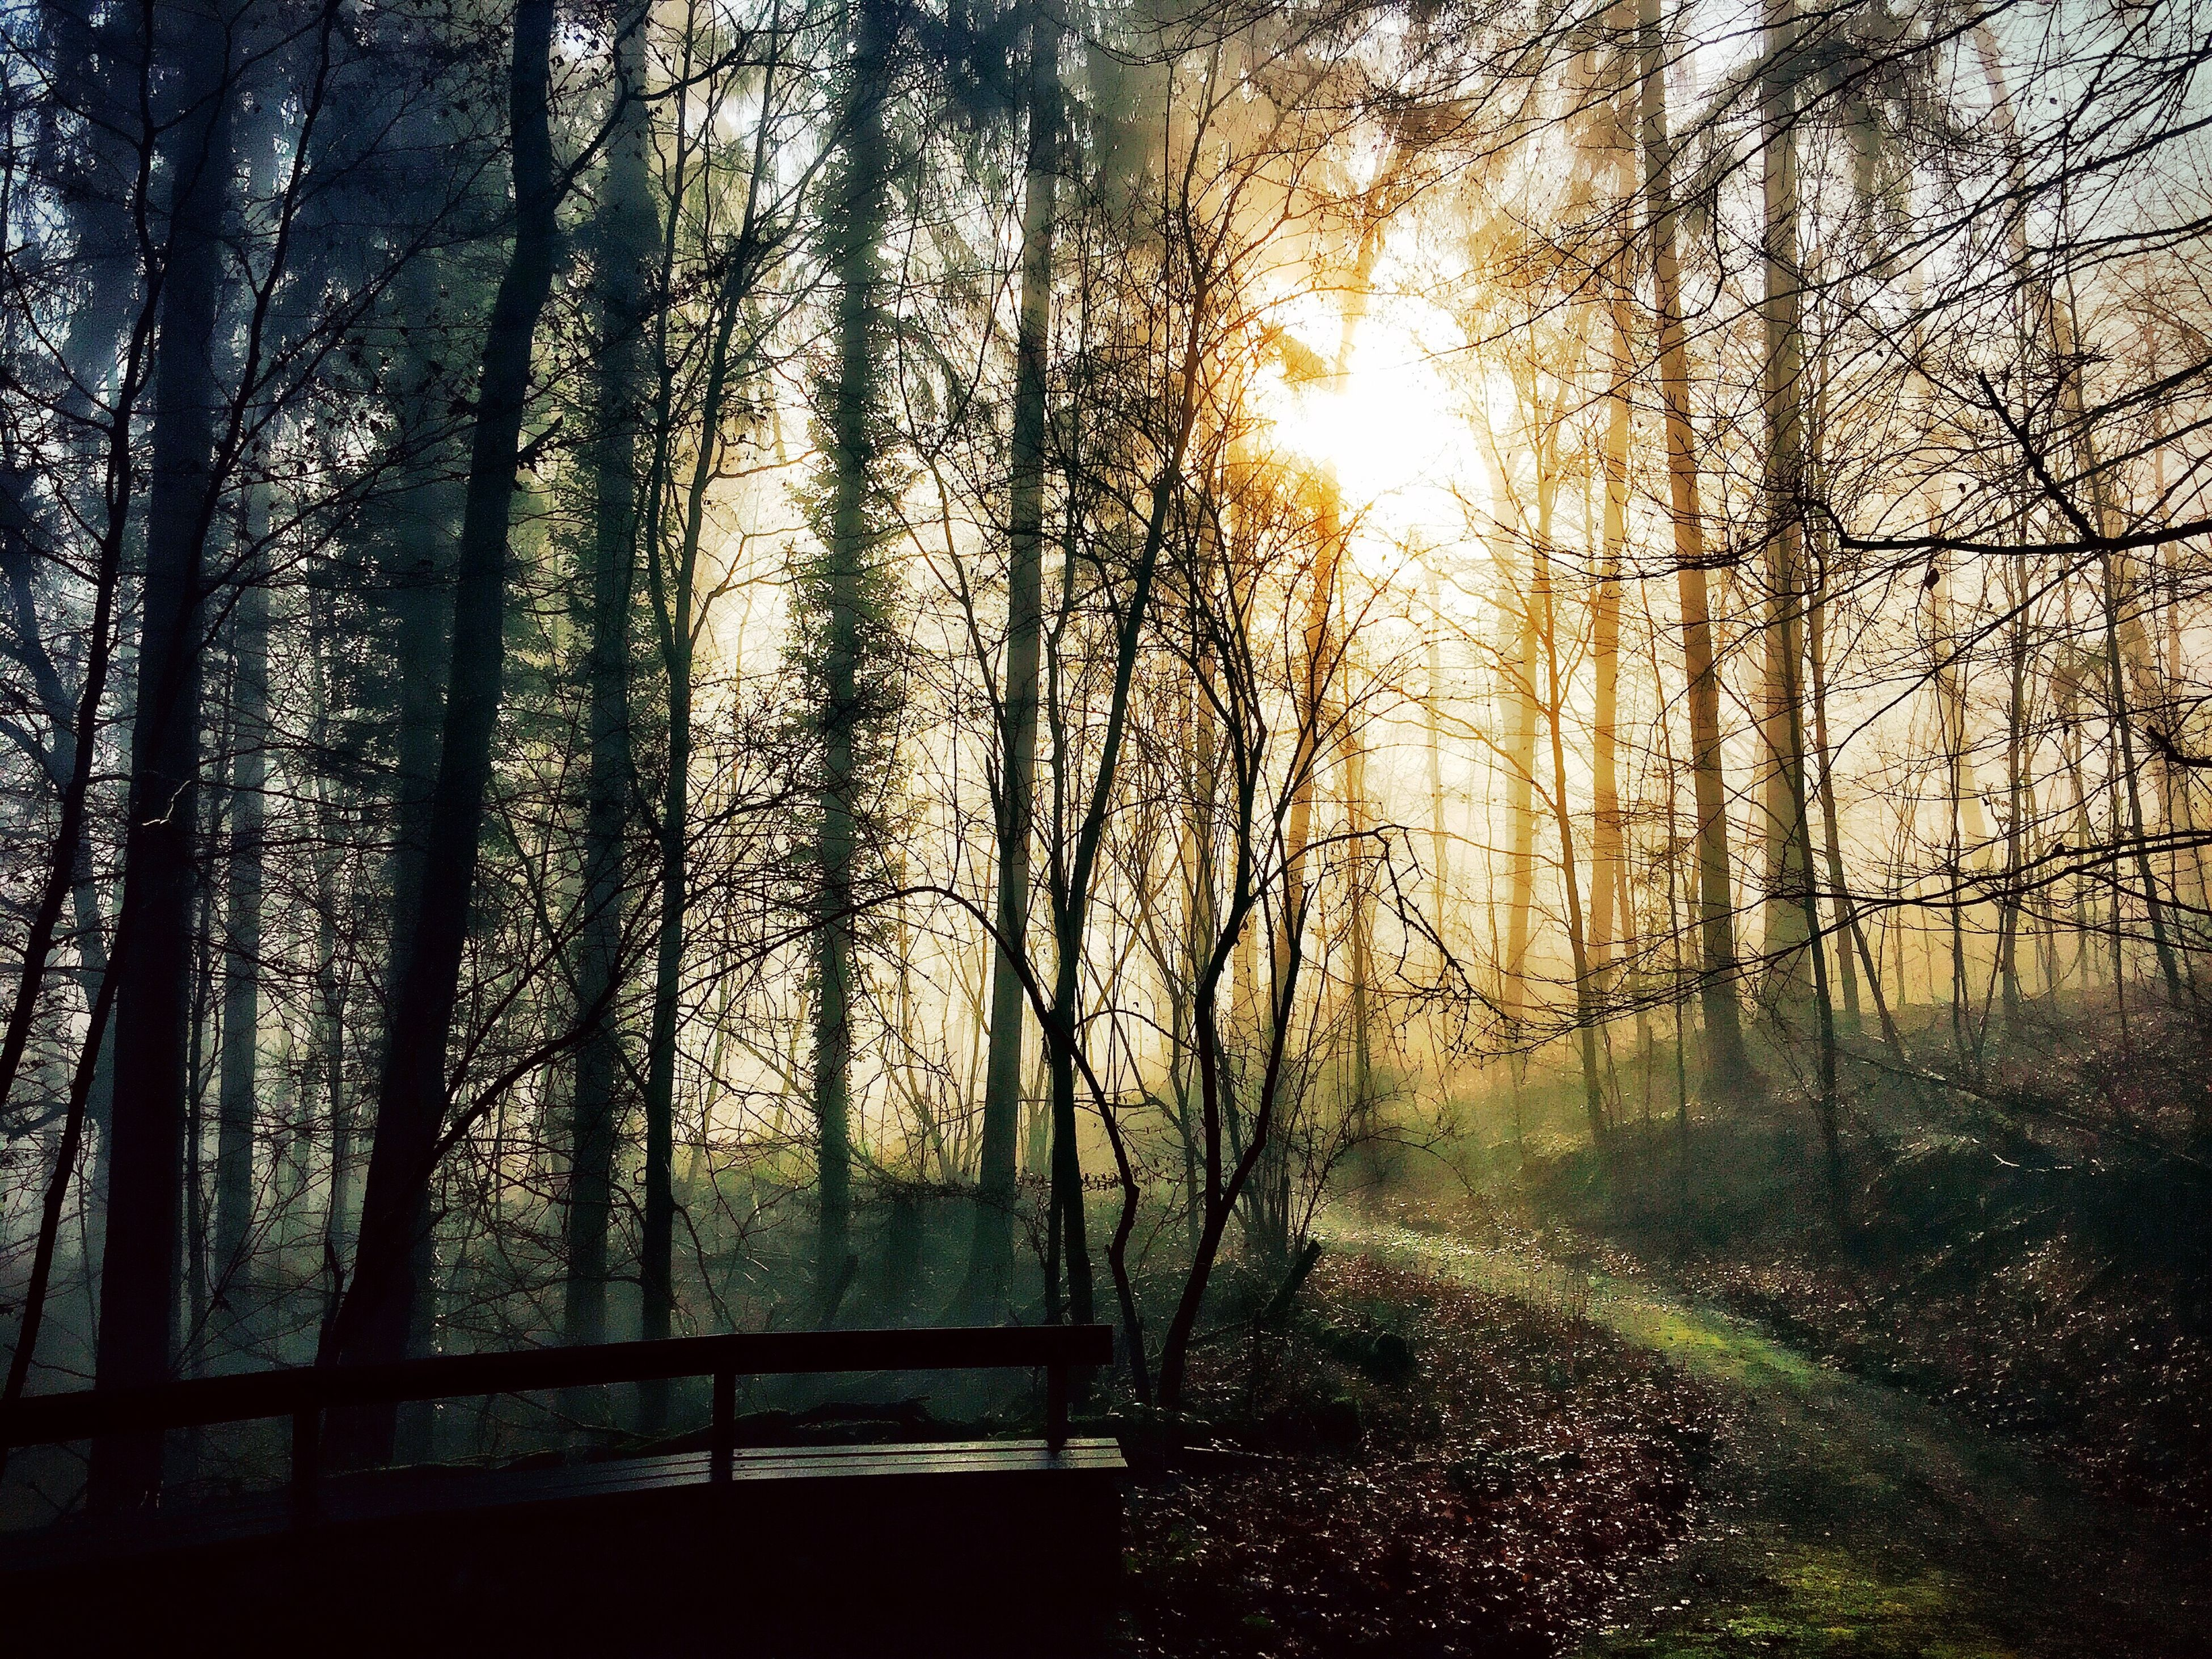 tree, tranquility, tranquil scene, sunlight, beauty in nature, scenics, forest, nature, tree trunk, growth, sun, sunbeam, woodland, branch, non-urban scene, idyllic, sunset, landscape, outdoors, railing